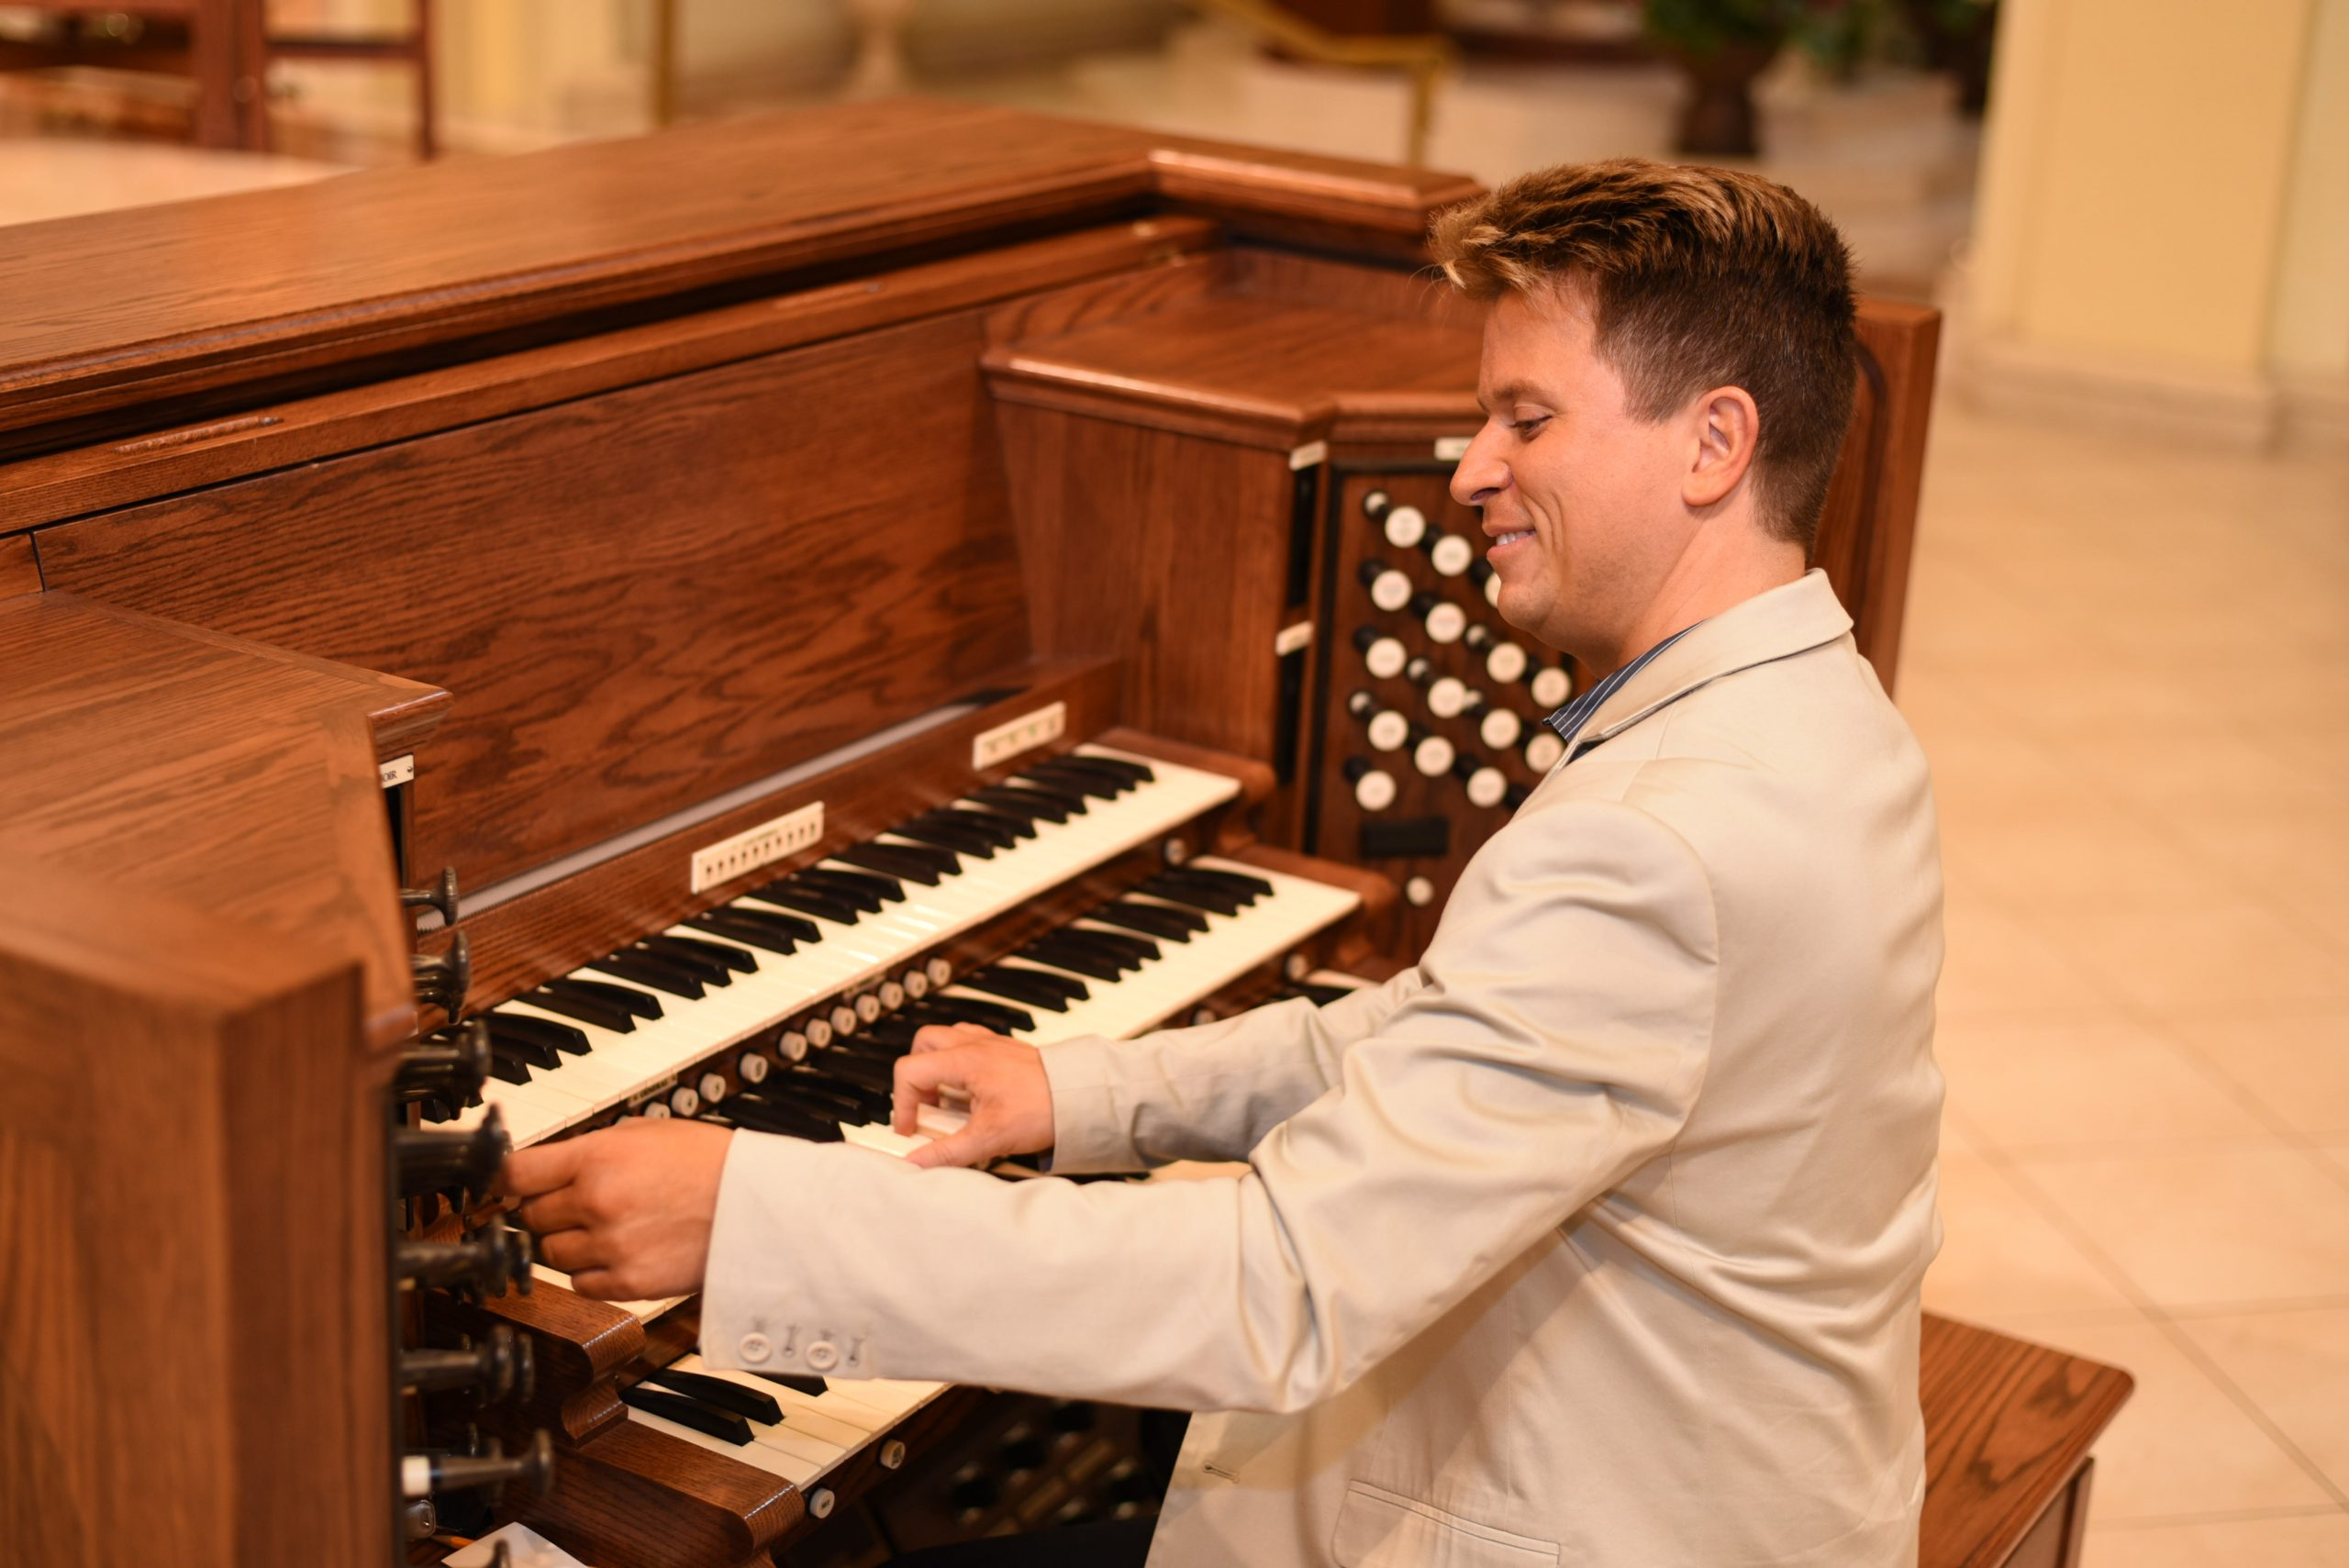 Enhanced organ makes joyful sounds